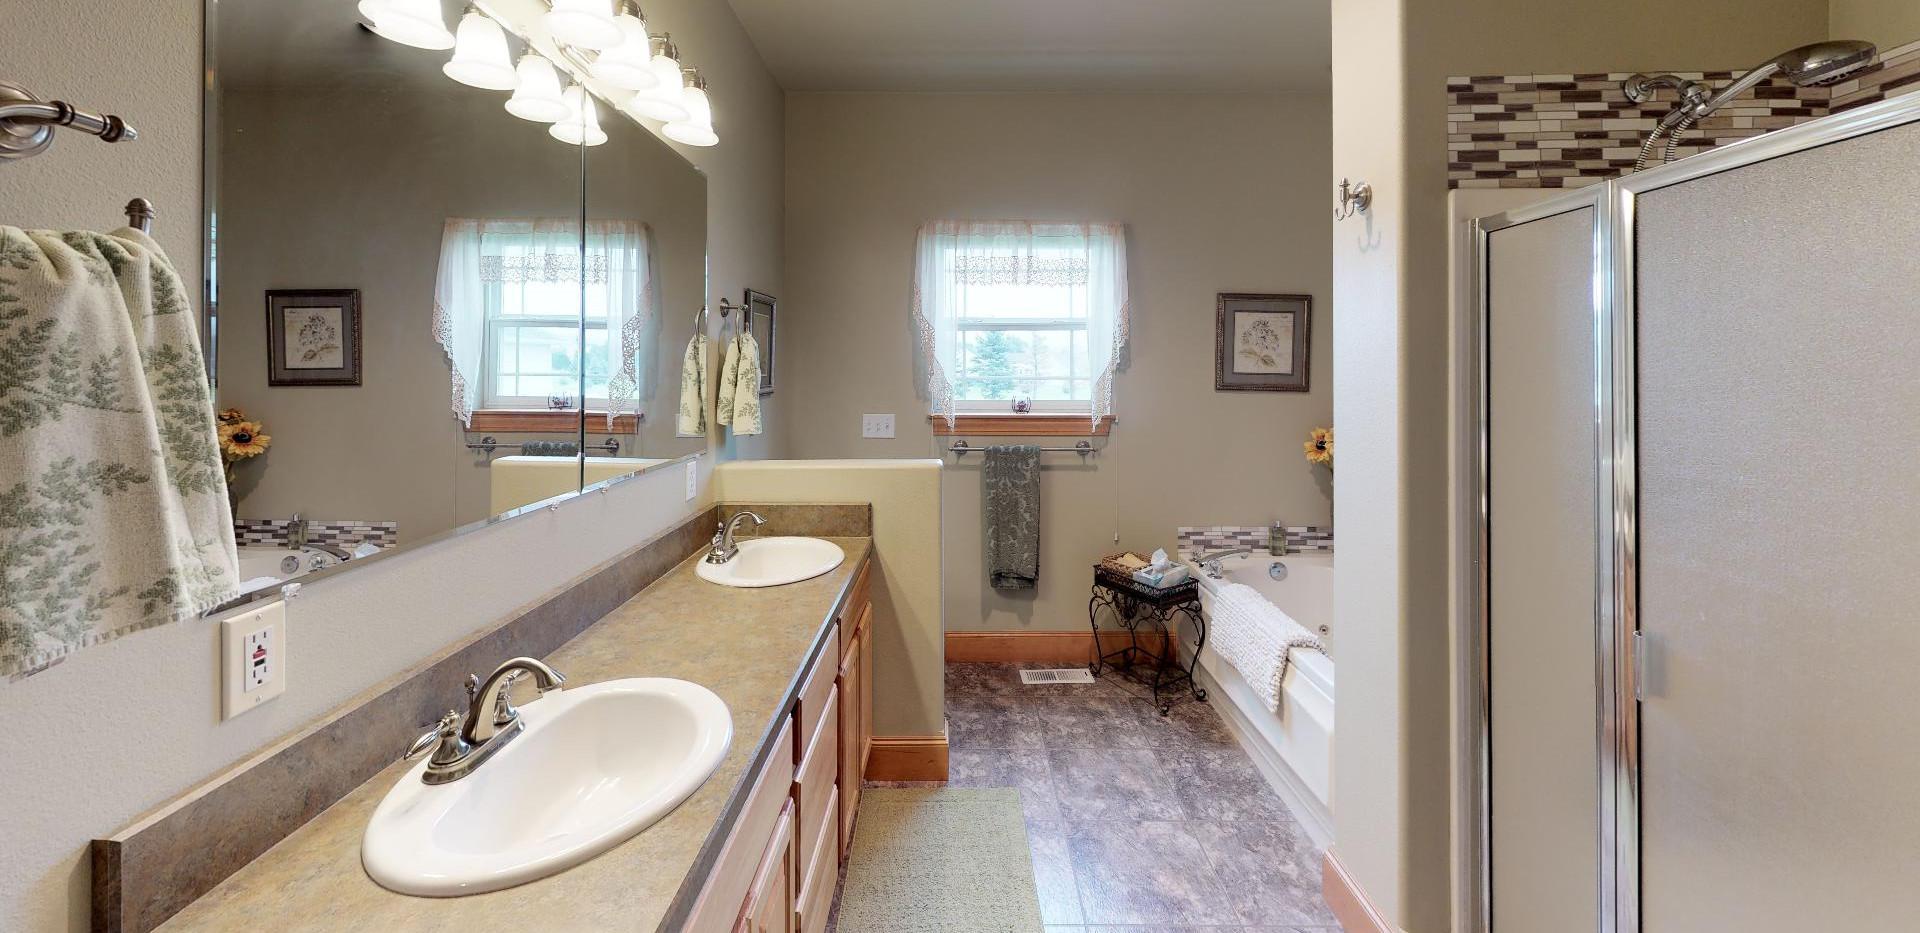 KFr8RyMwd2q - Bathroom.jpg